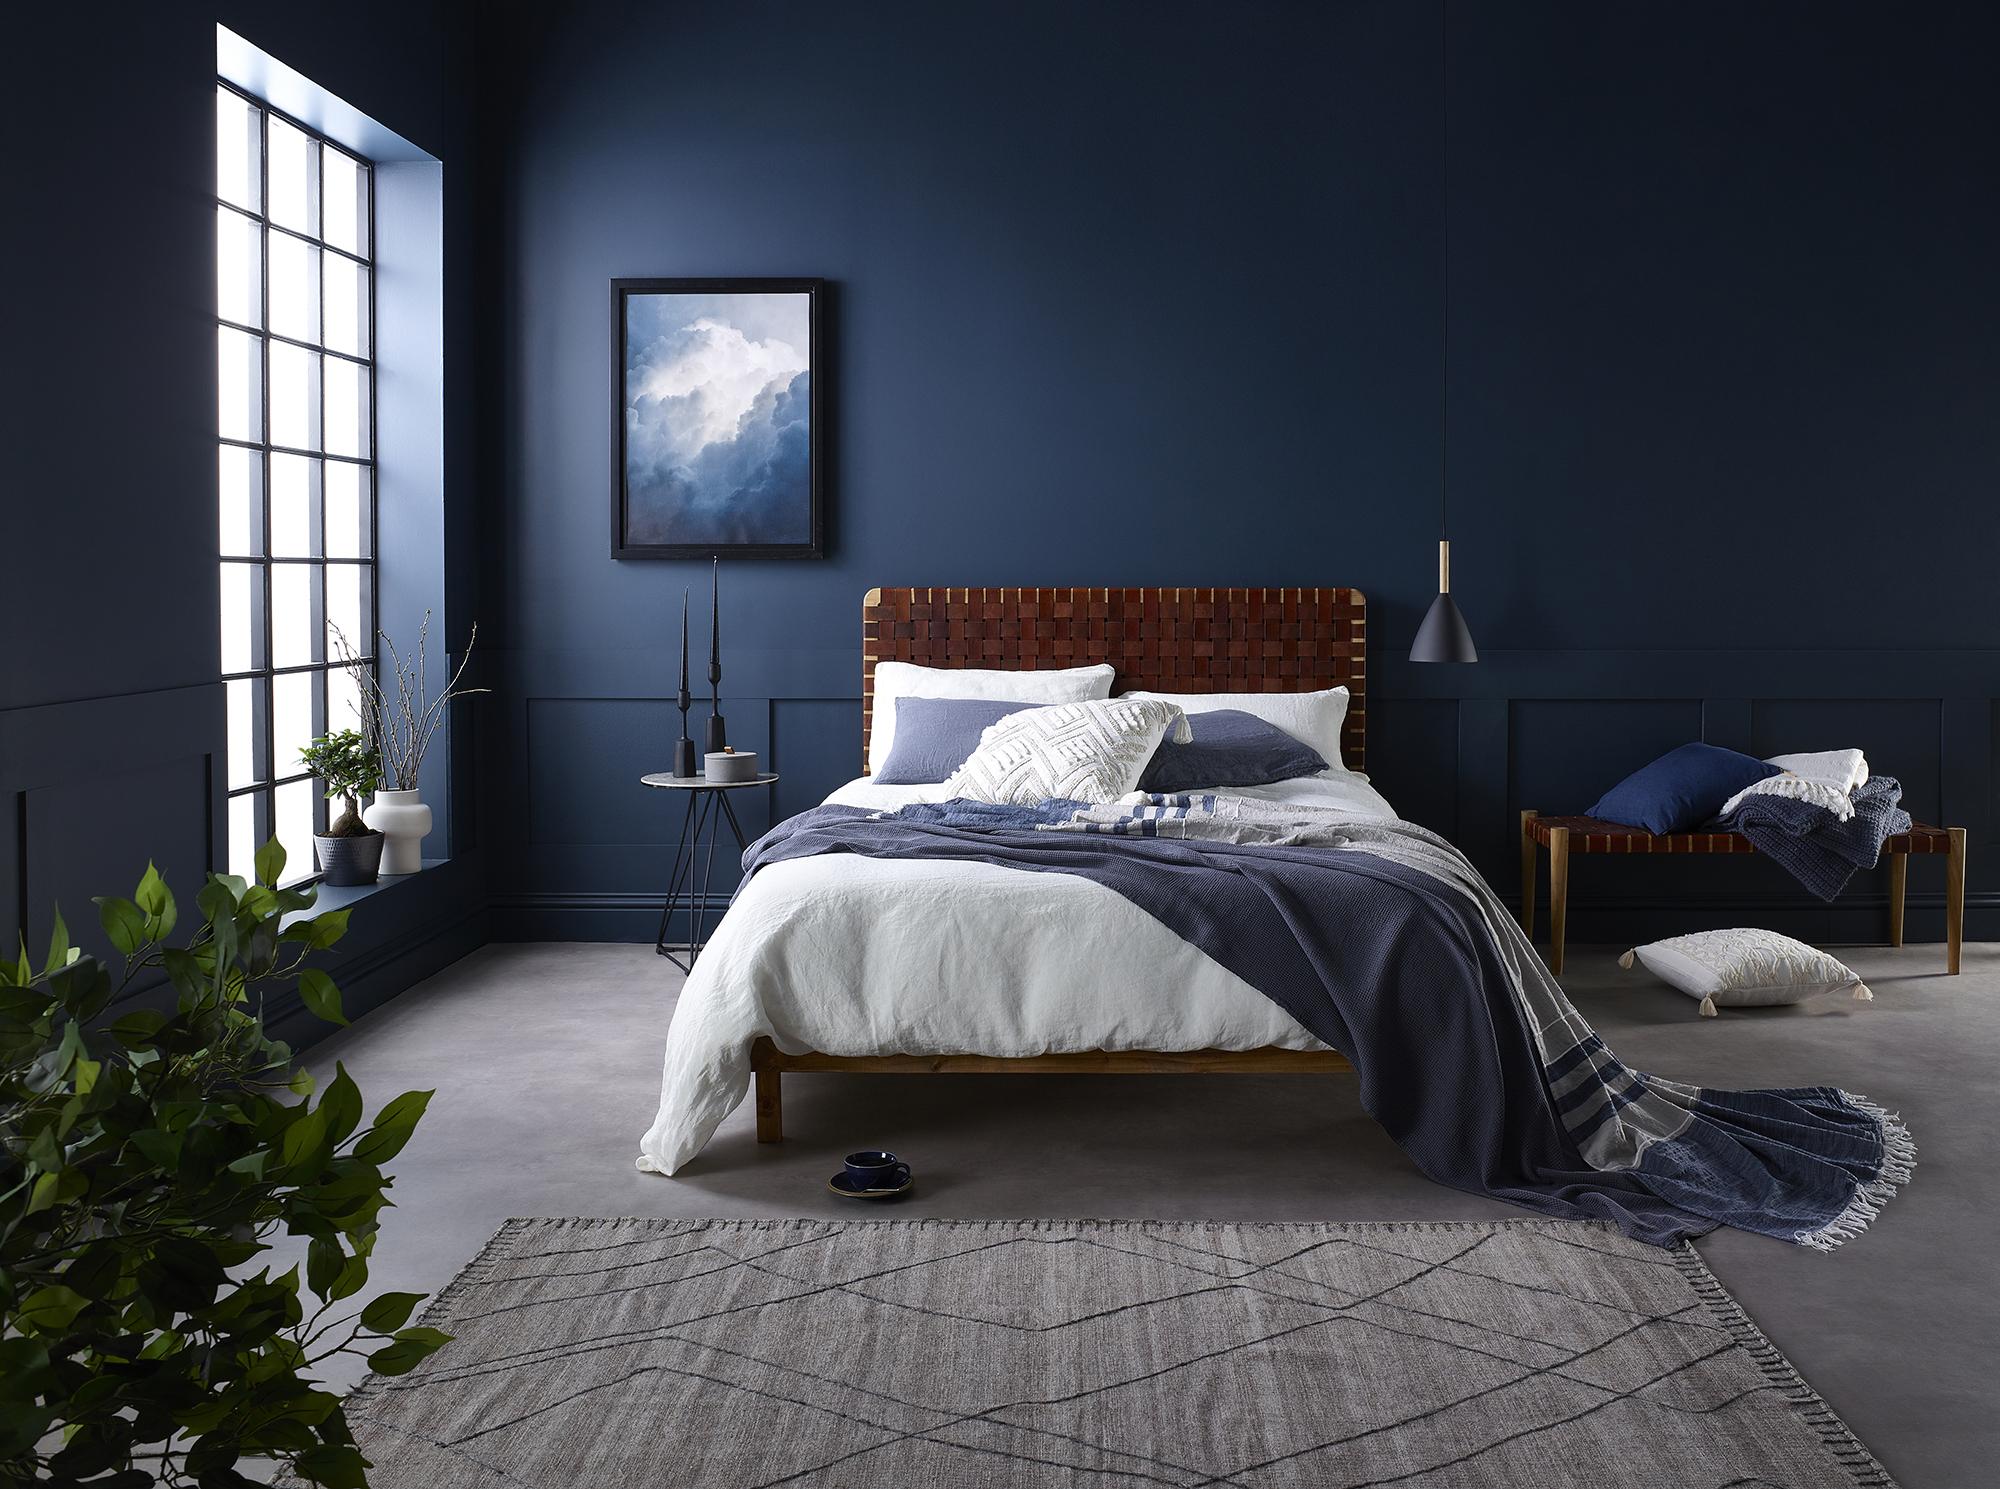 Cool blue tones of a bedroom: improving Memory Foam Warehouse's brand creative